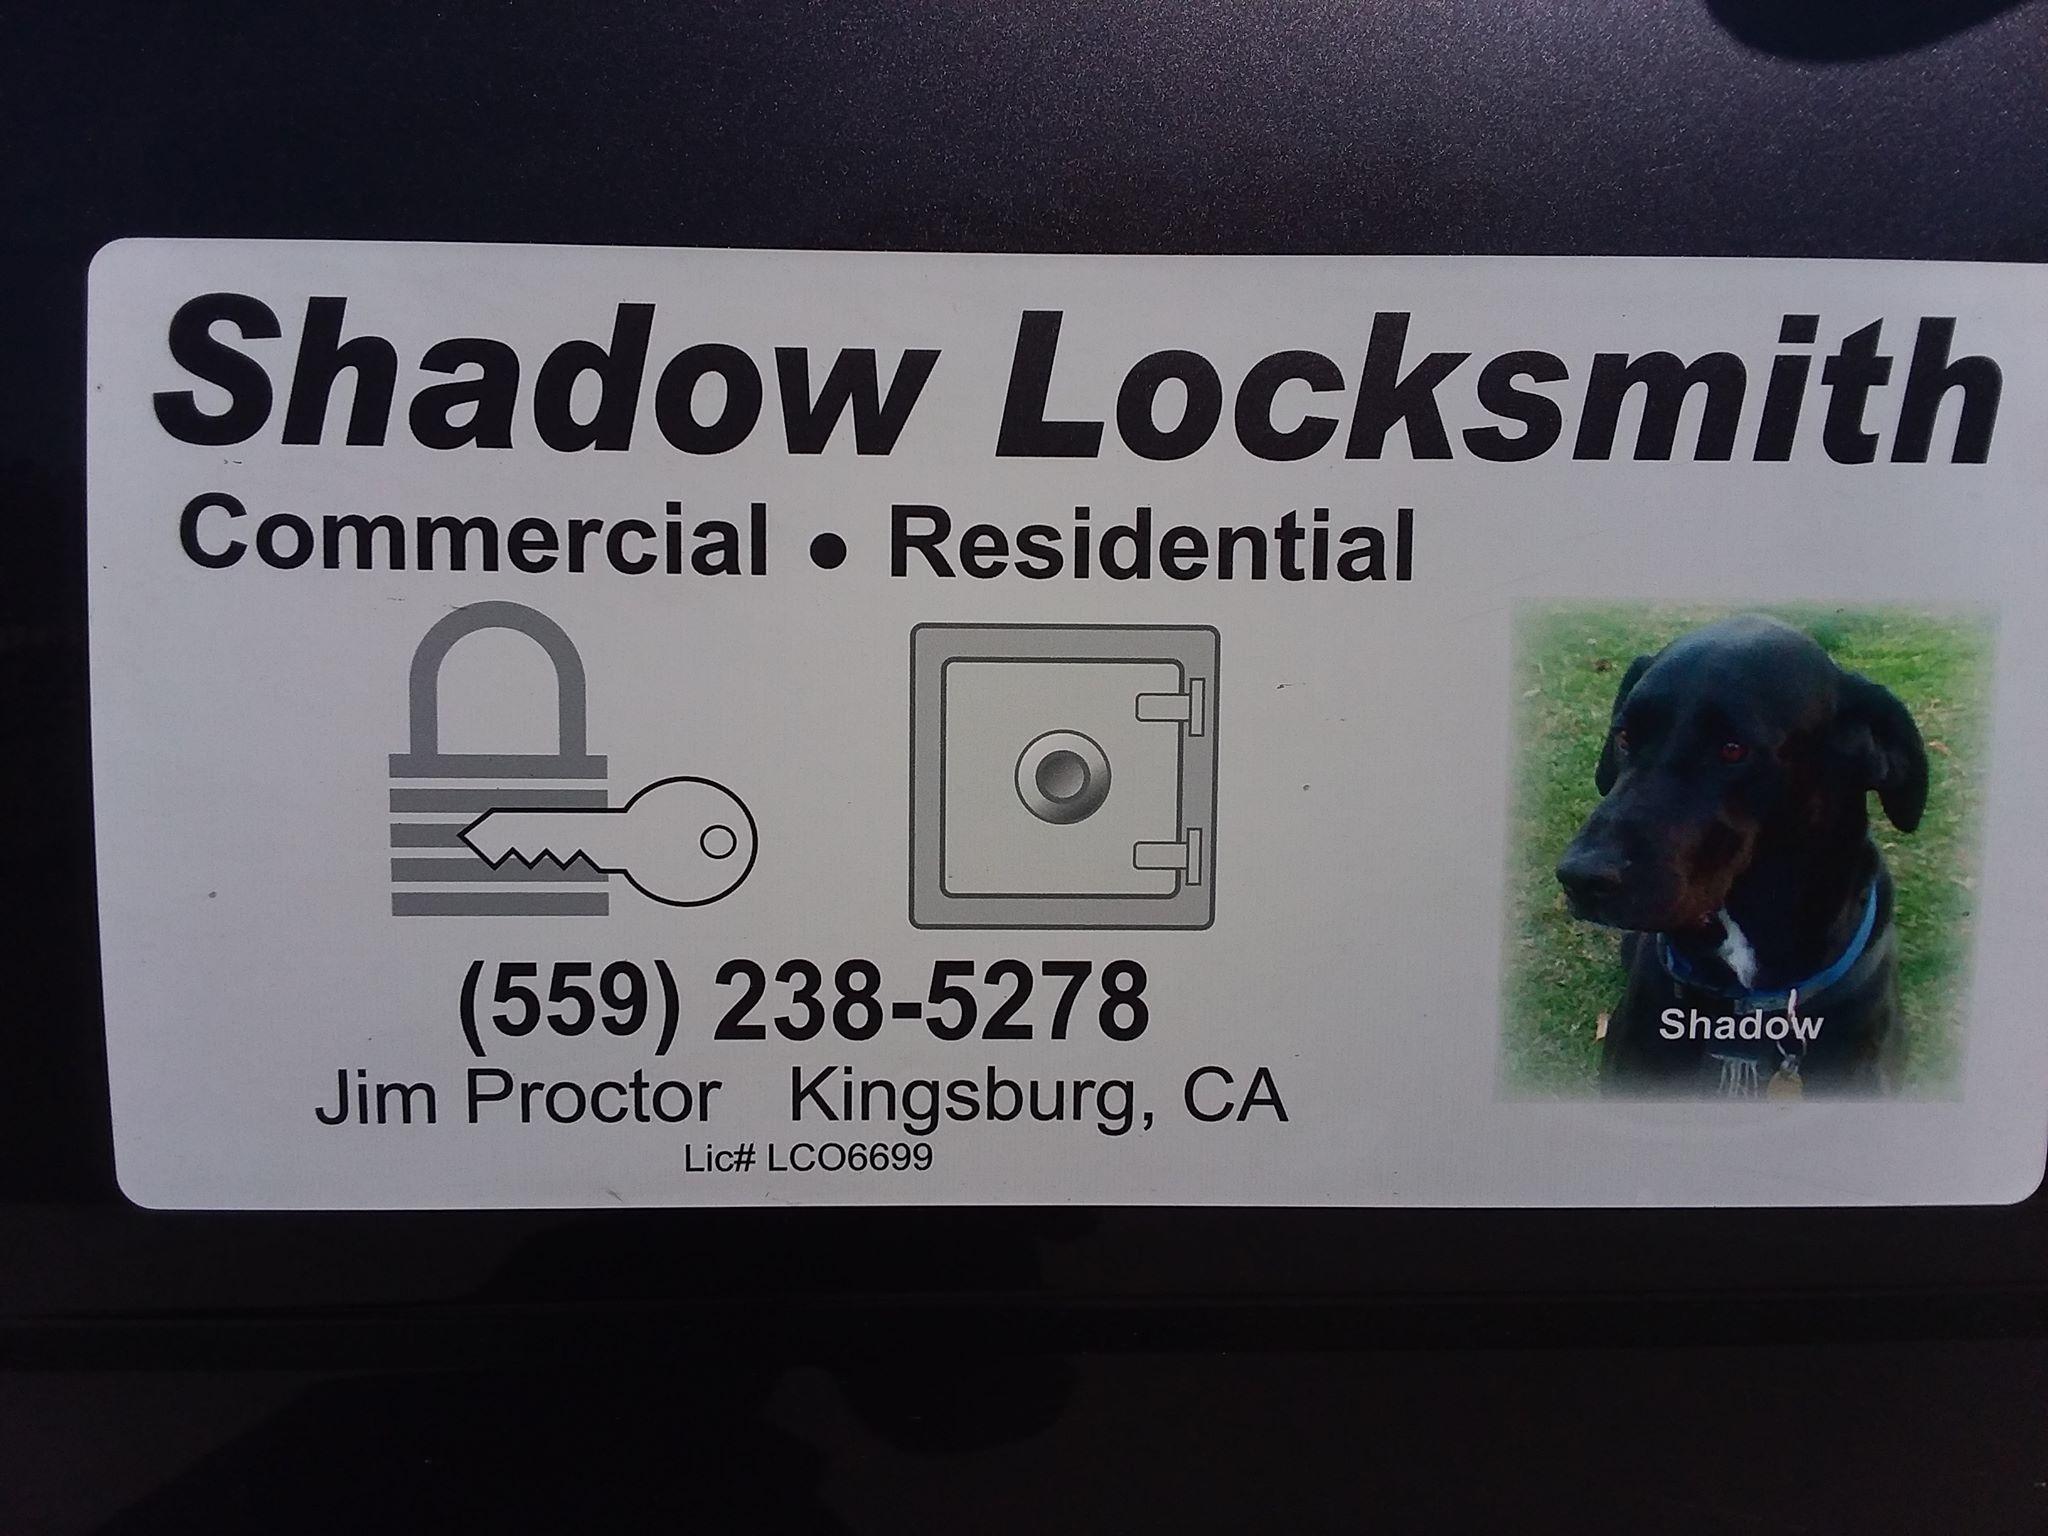 Shadow Locksmith